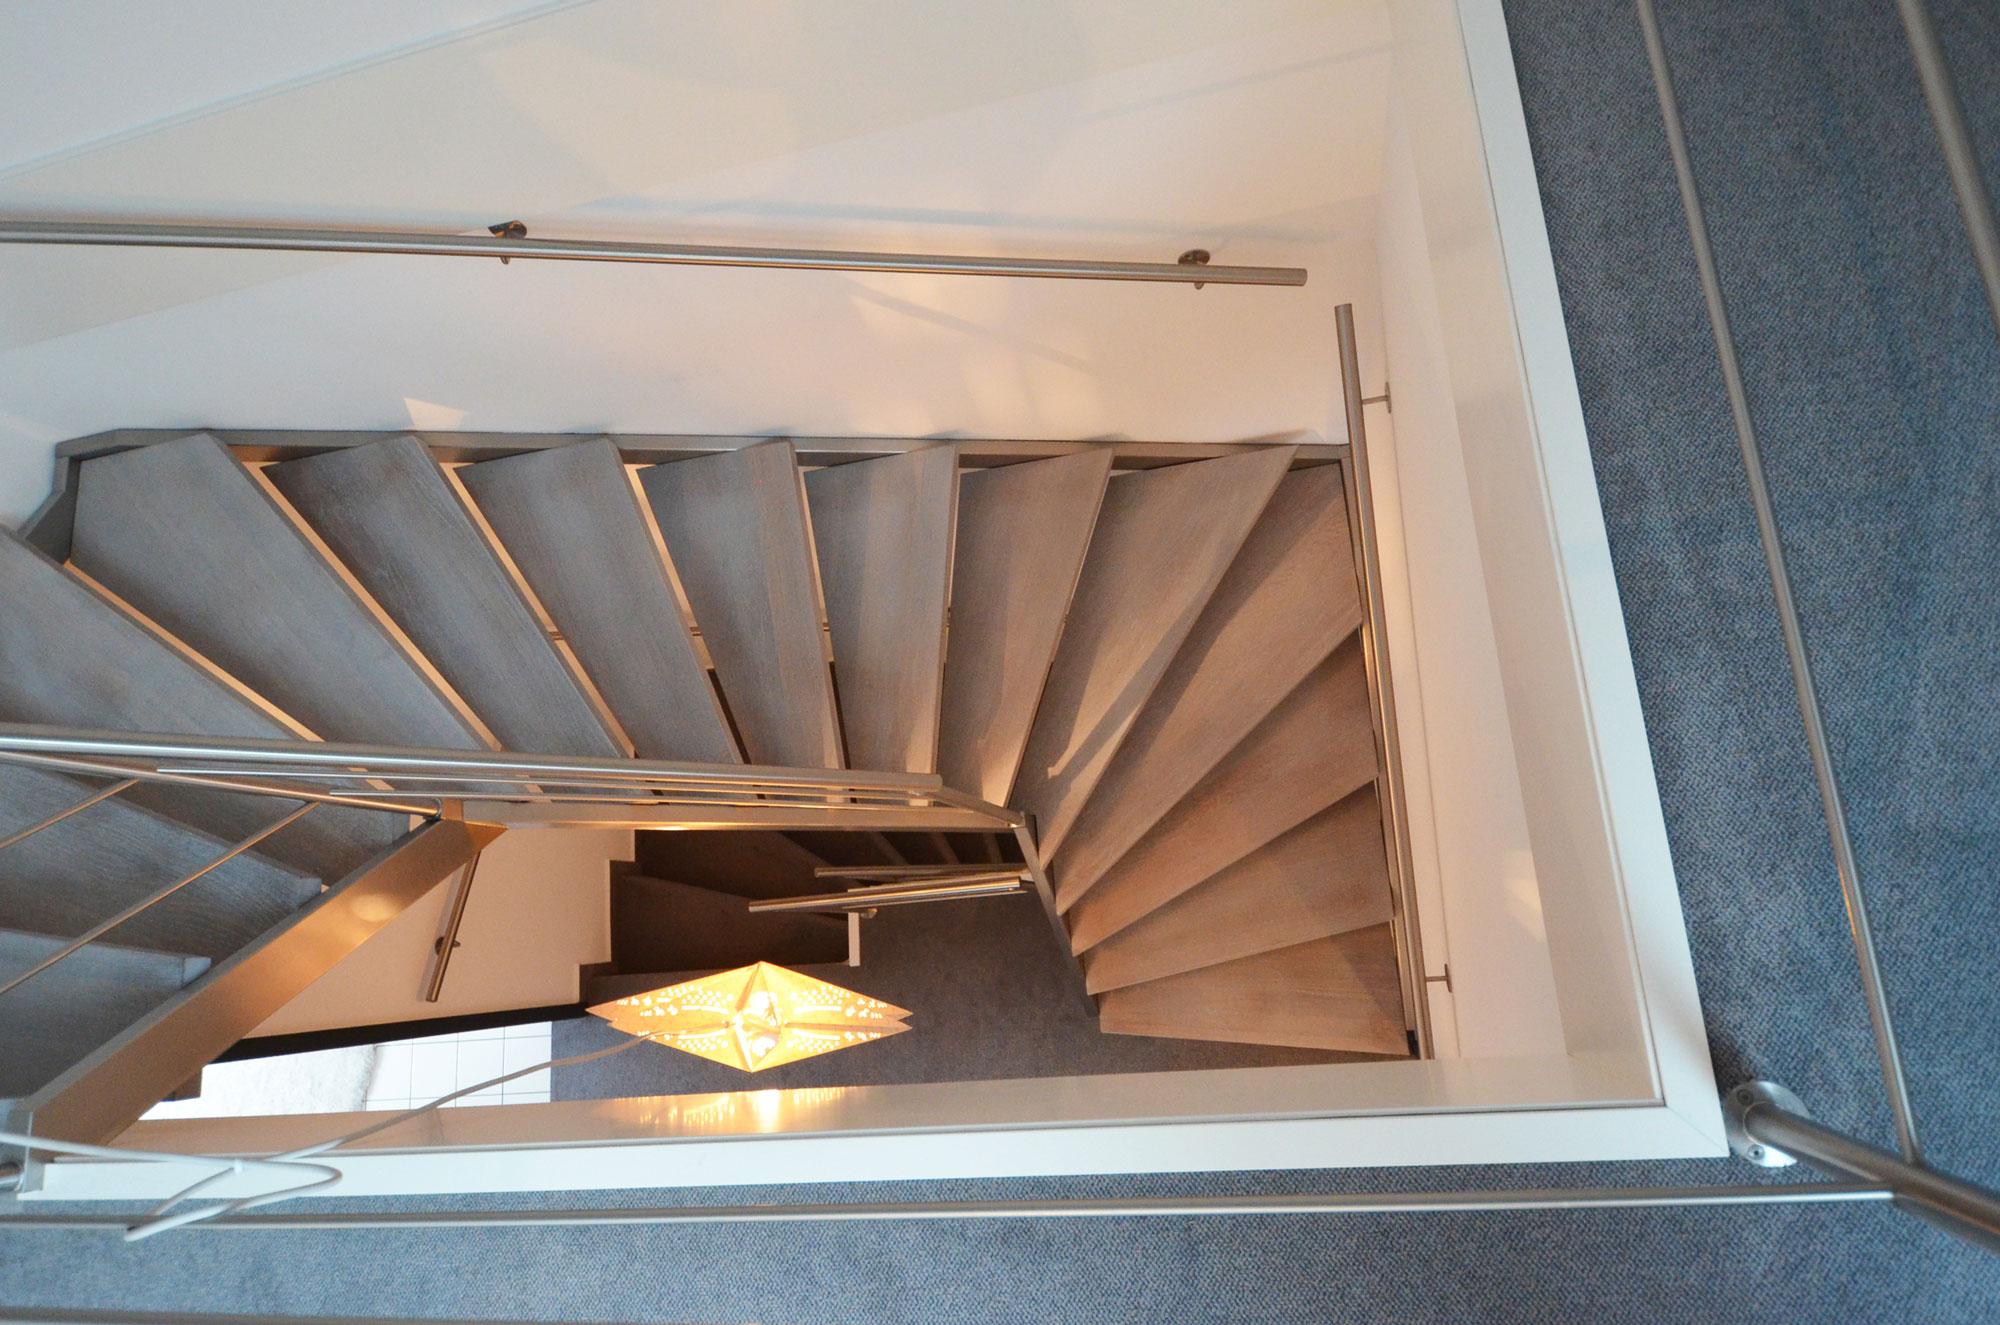 stahlwangentreppe aus edelstahl in hofheim treppenbau diehl frankfurt. Black Bedroom Furniture Sets. Home Design Ideas